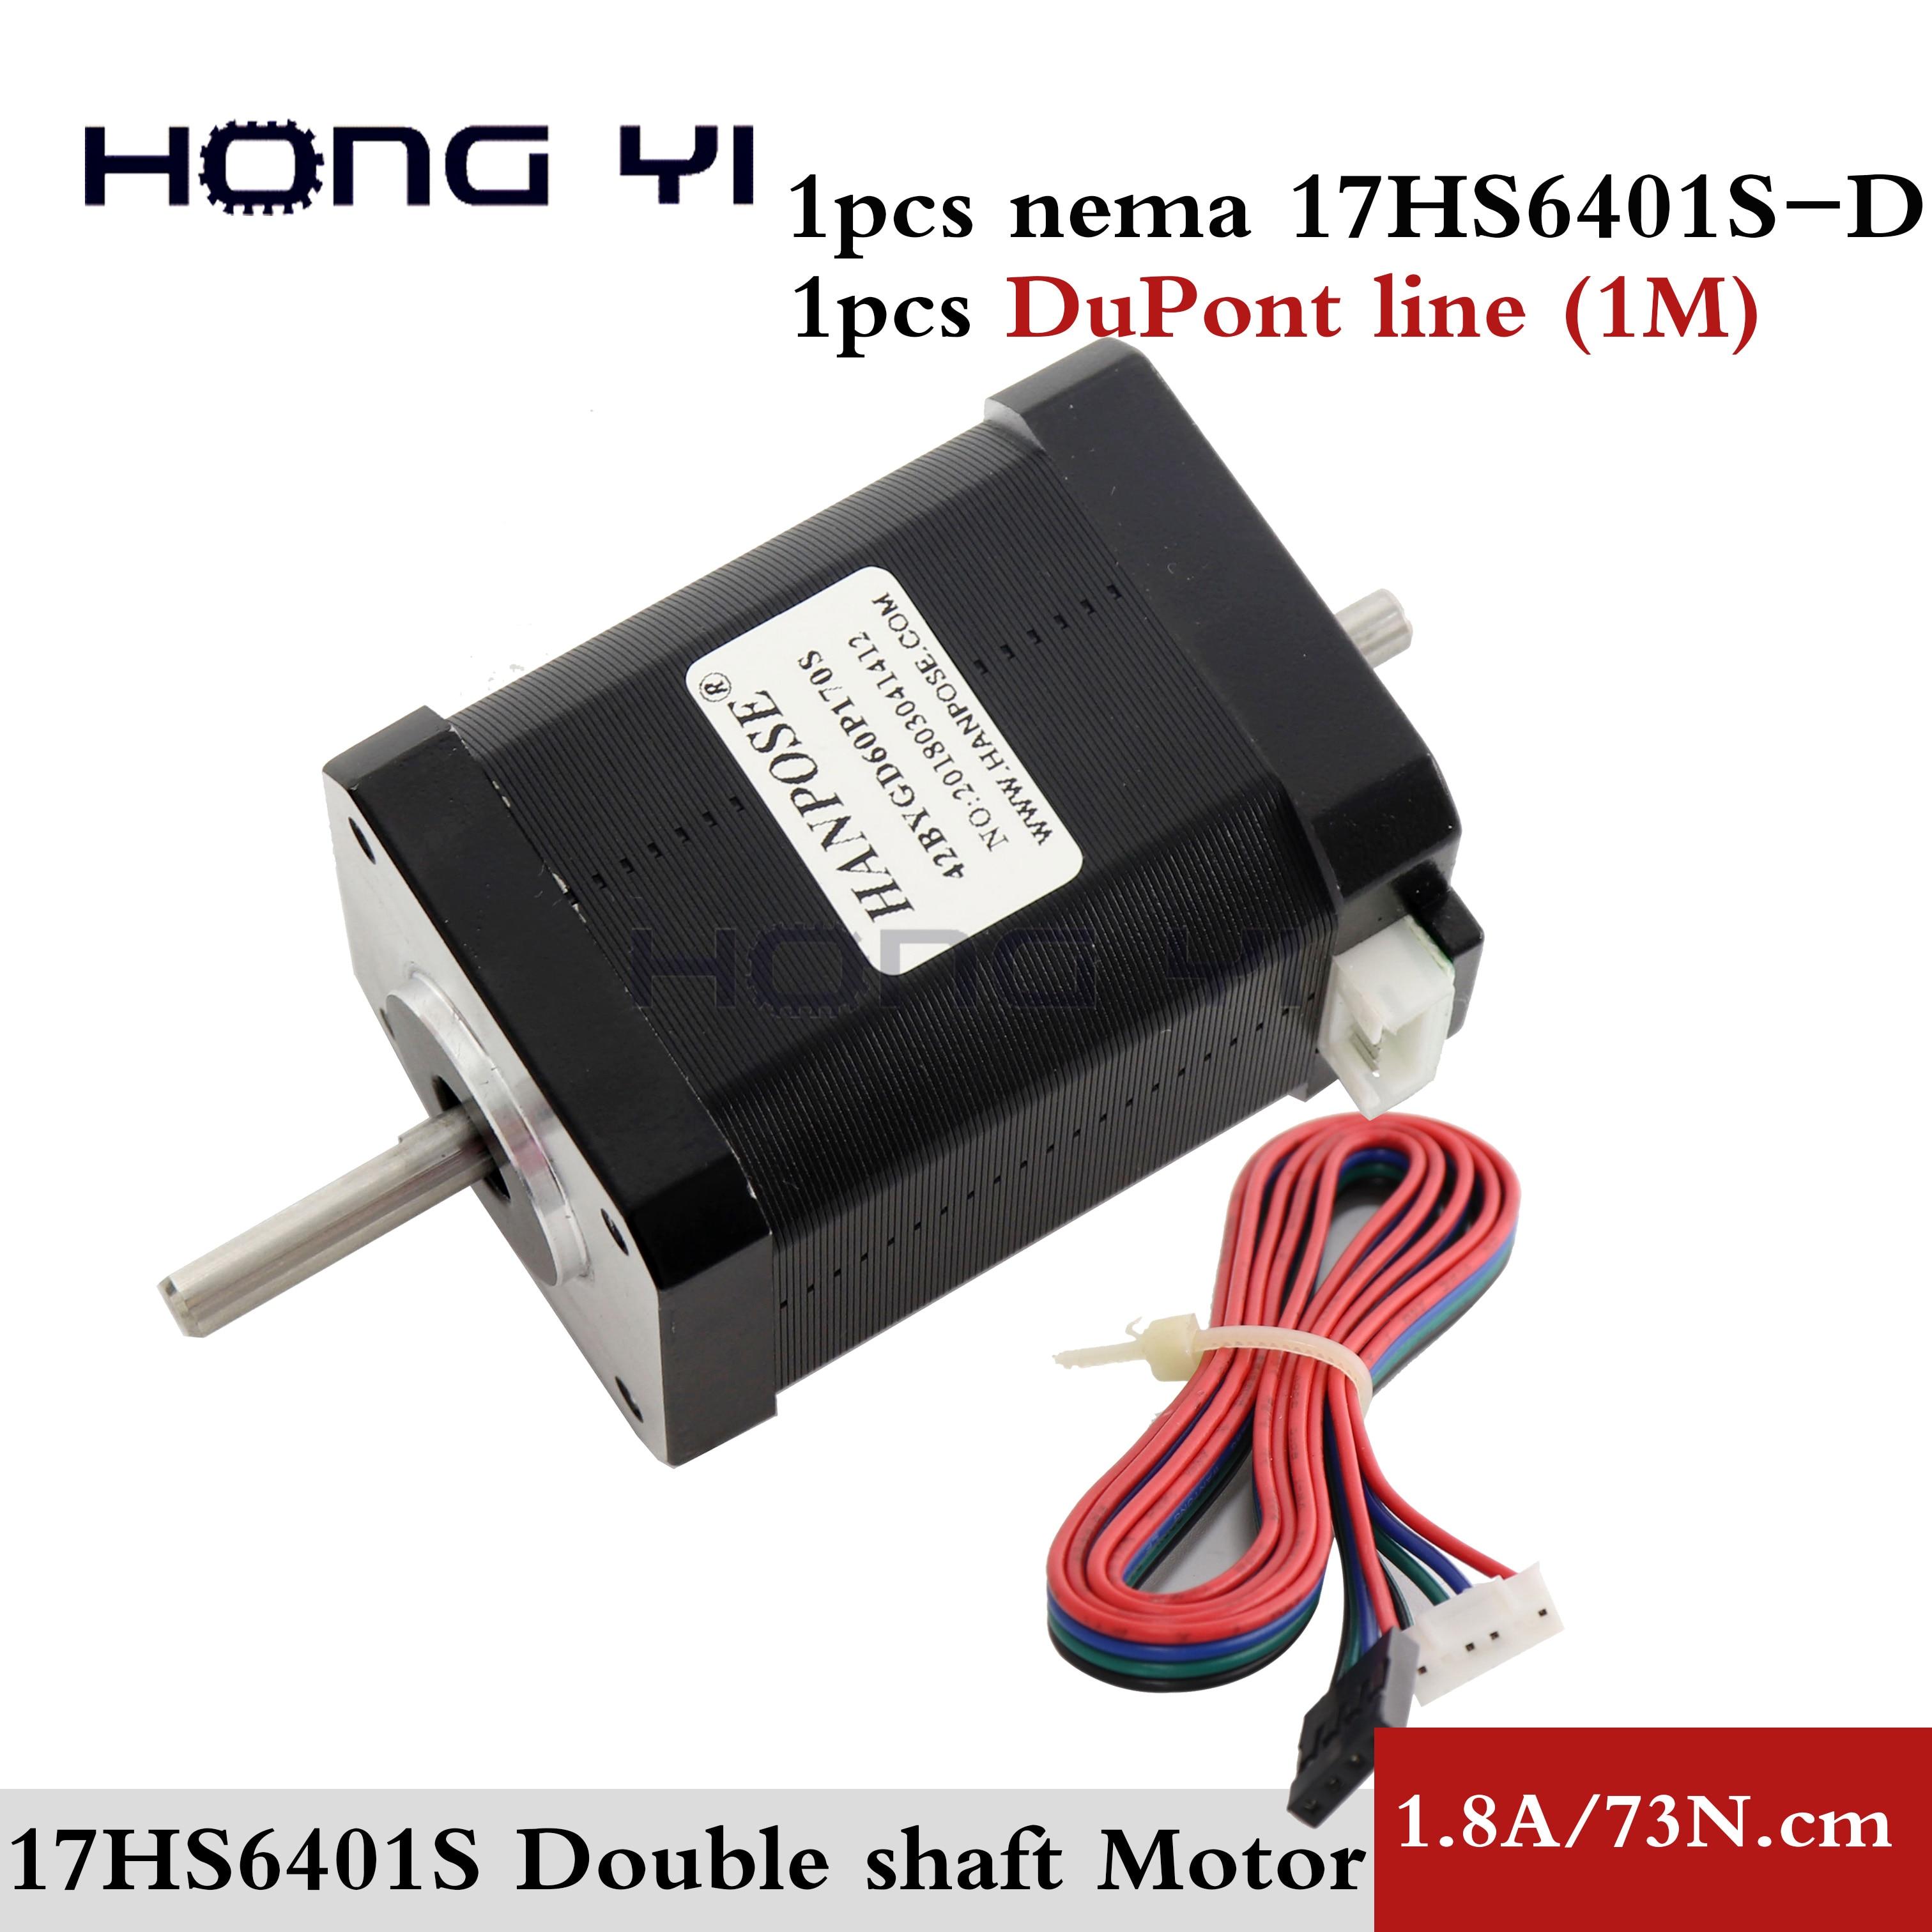 Envío Gratis motor paso a paso híbrido motor nema 17 60mm (1.7A... 0.73NM 60mm 4-de alambre) 17HS6401S para 3D impresora cnc